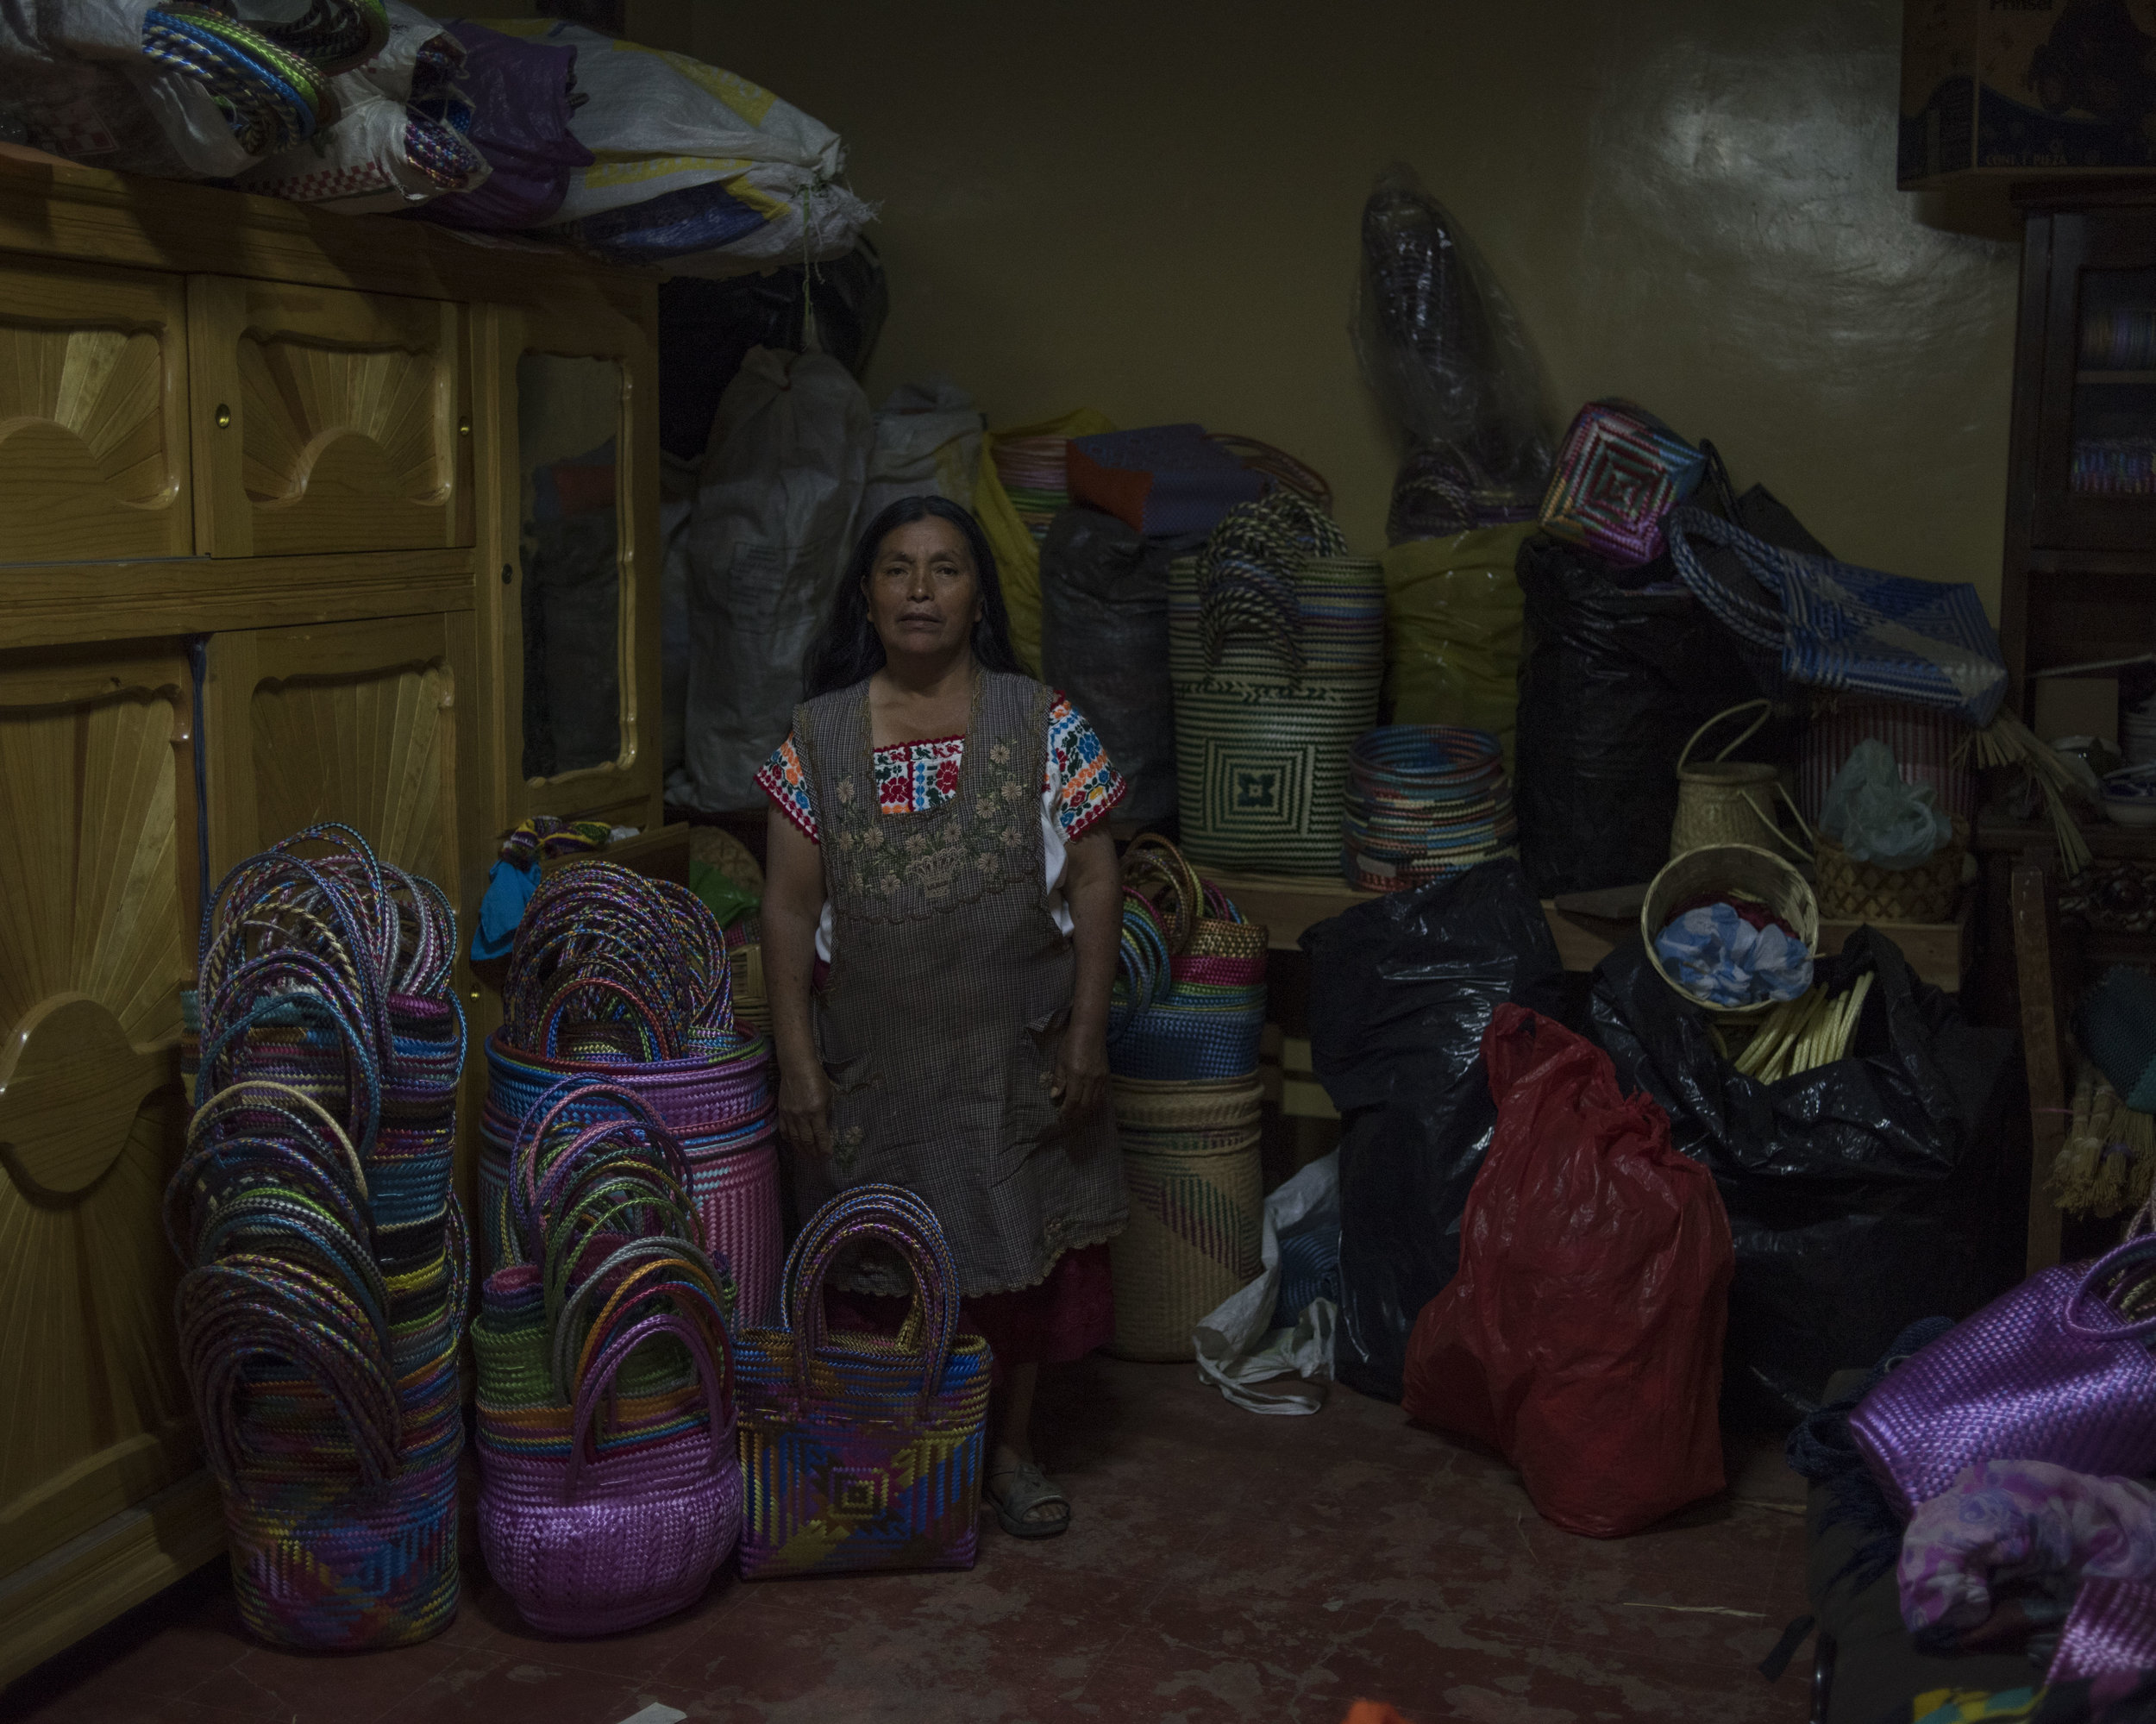 Antonia Vasquez Hernandez, Teotitlan, OAX.